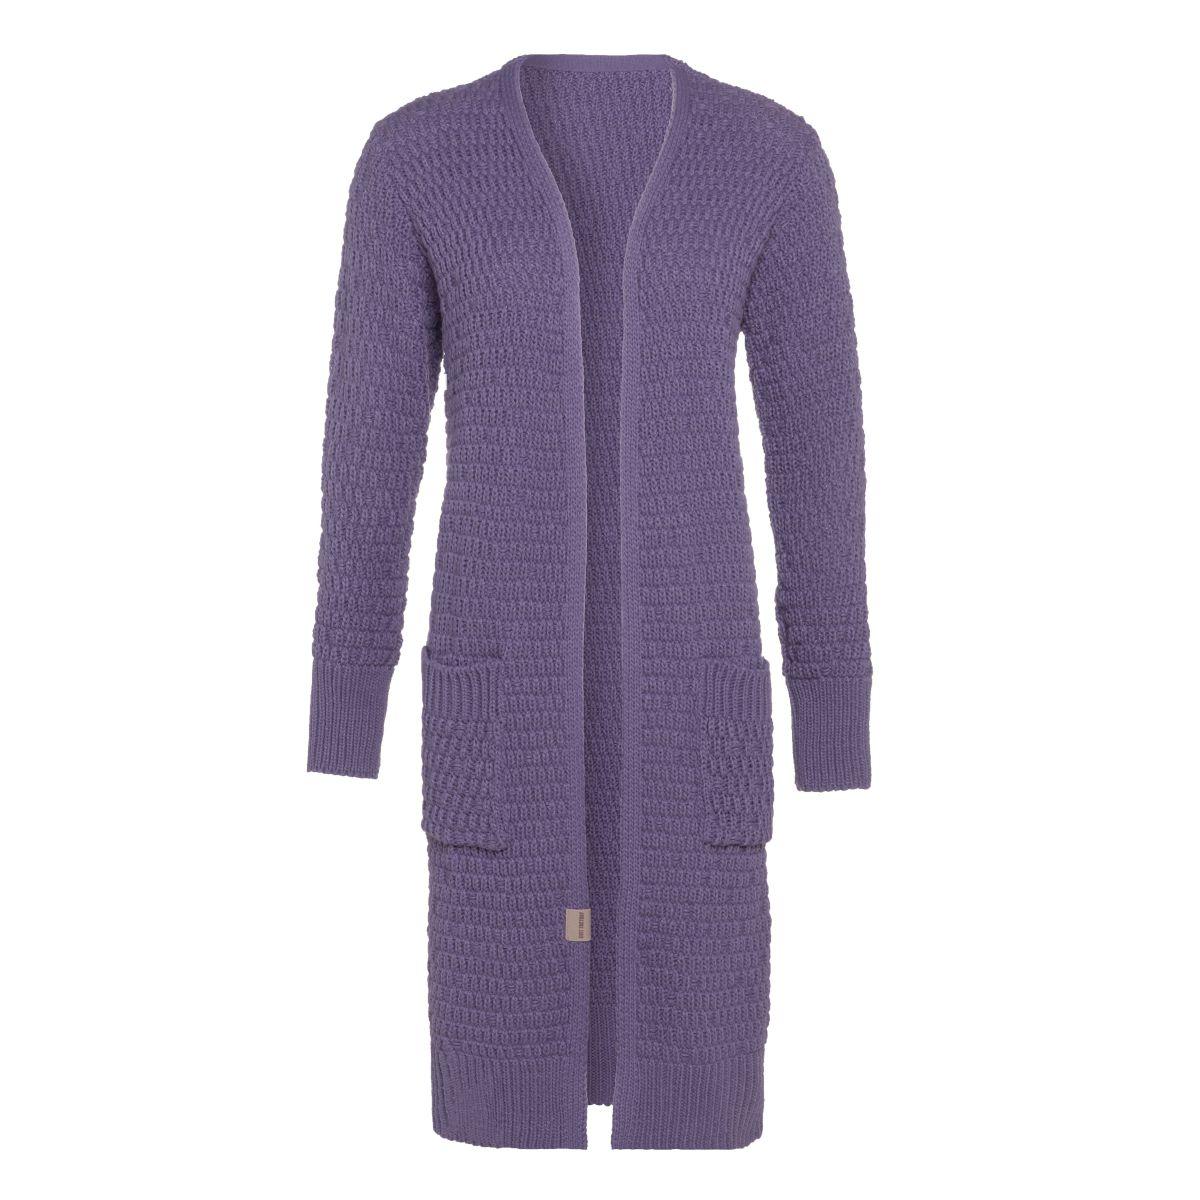 jaida lang gebreid vest violet 4042 met steekzakken